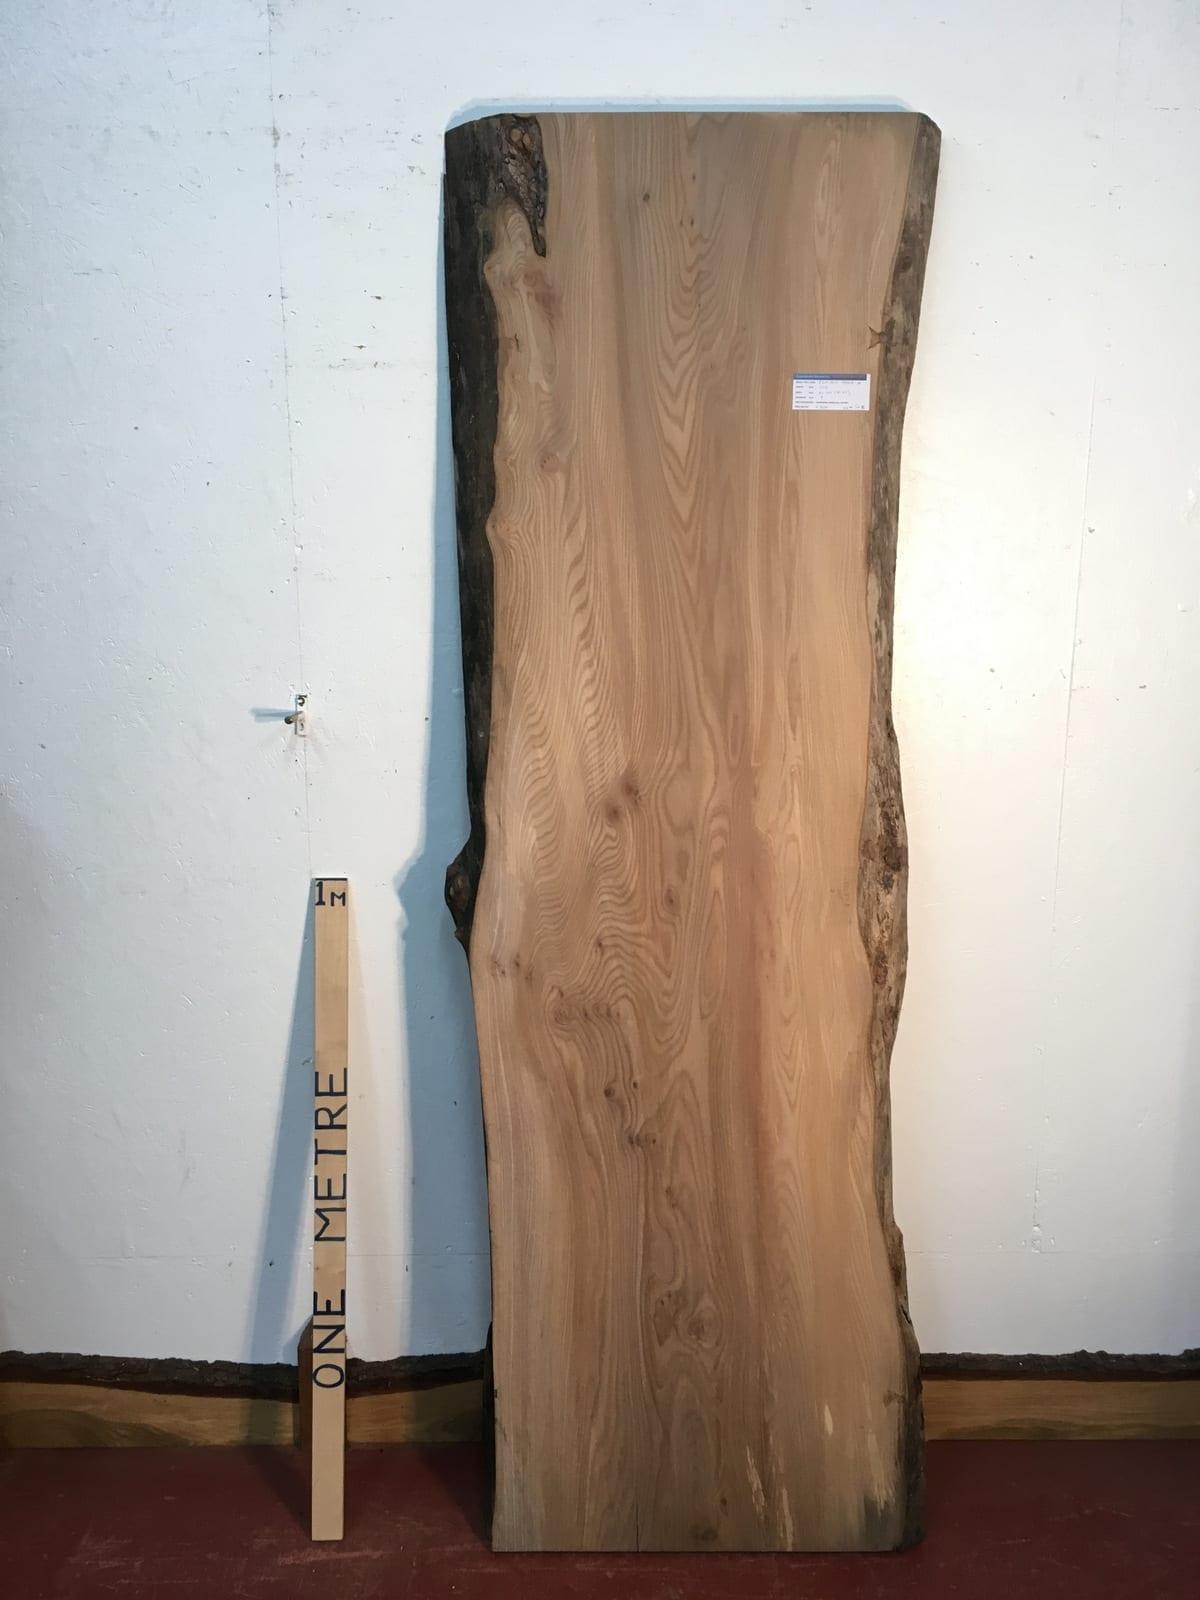 ELM Natural Waney Live Edge Slab Wood Board 1332A-8